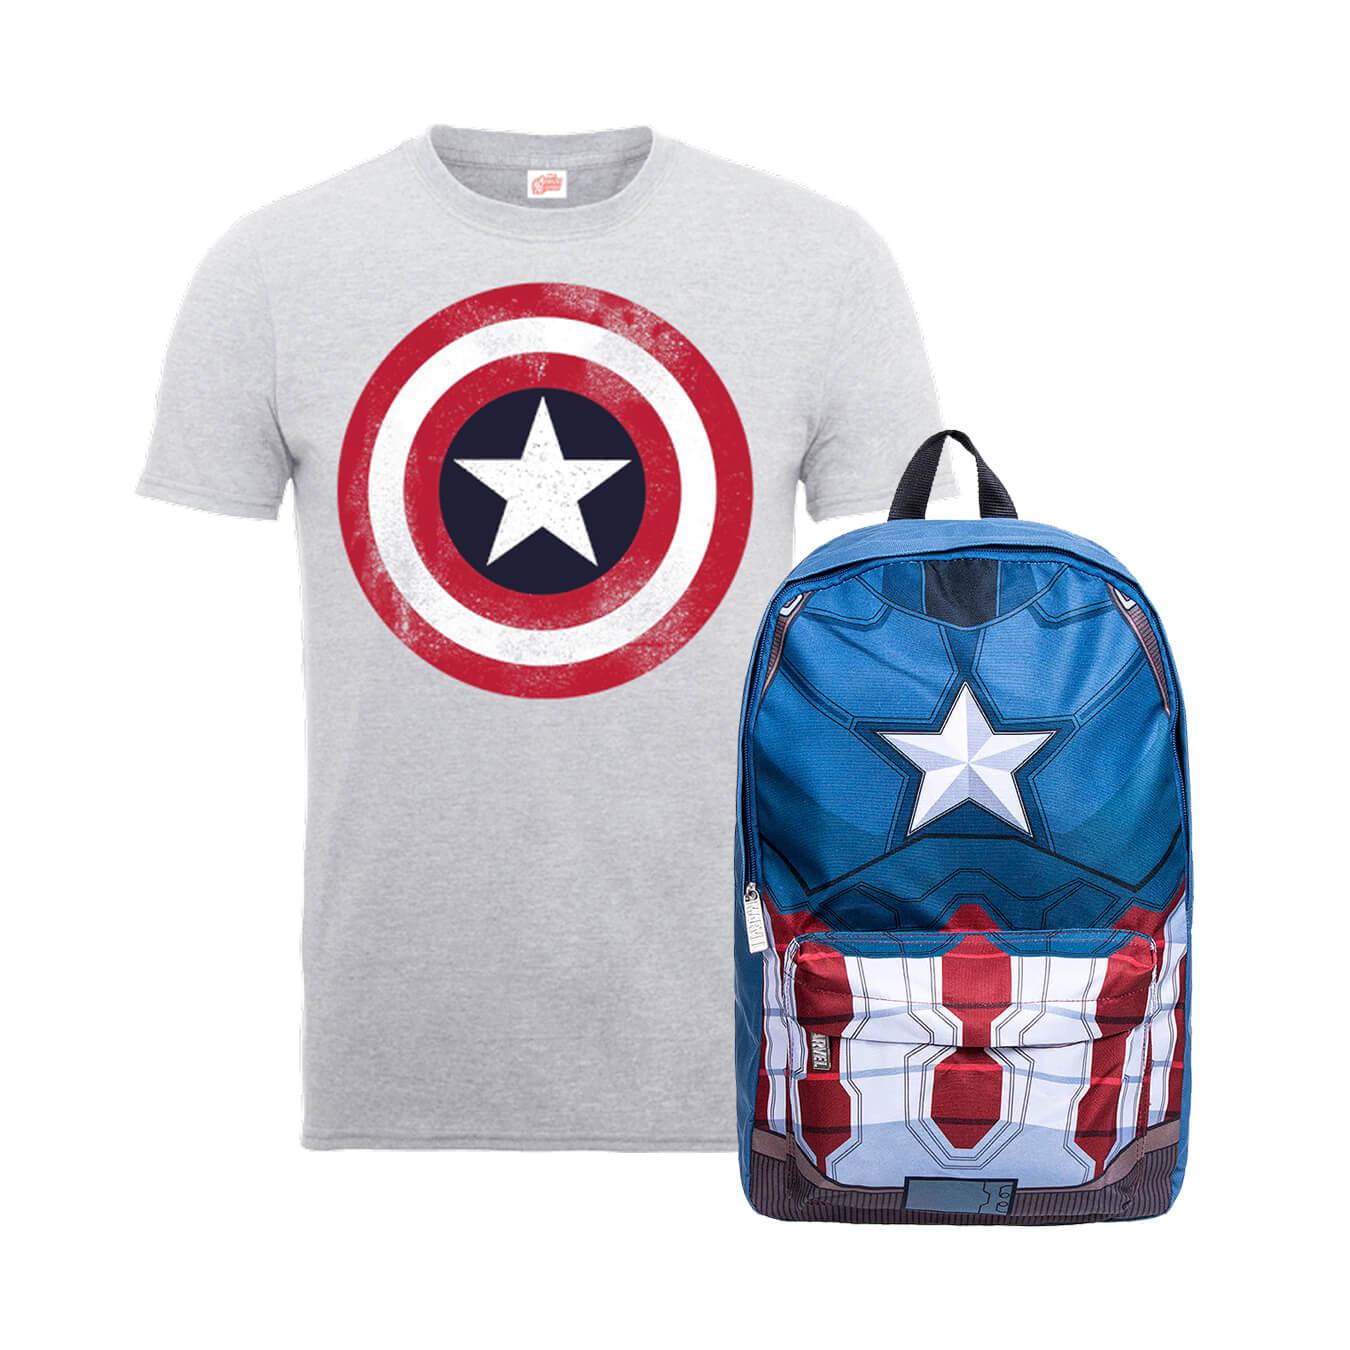 Pack Capitán América: Camiseta + Mochila